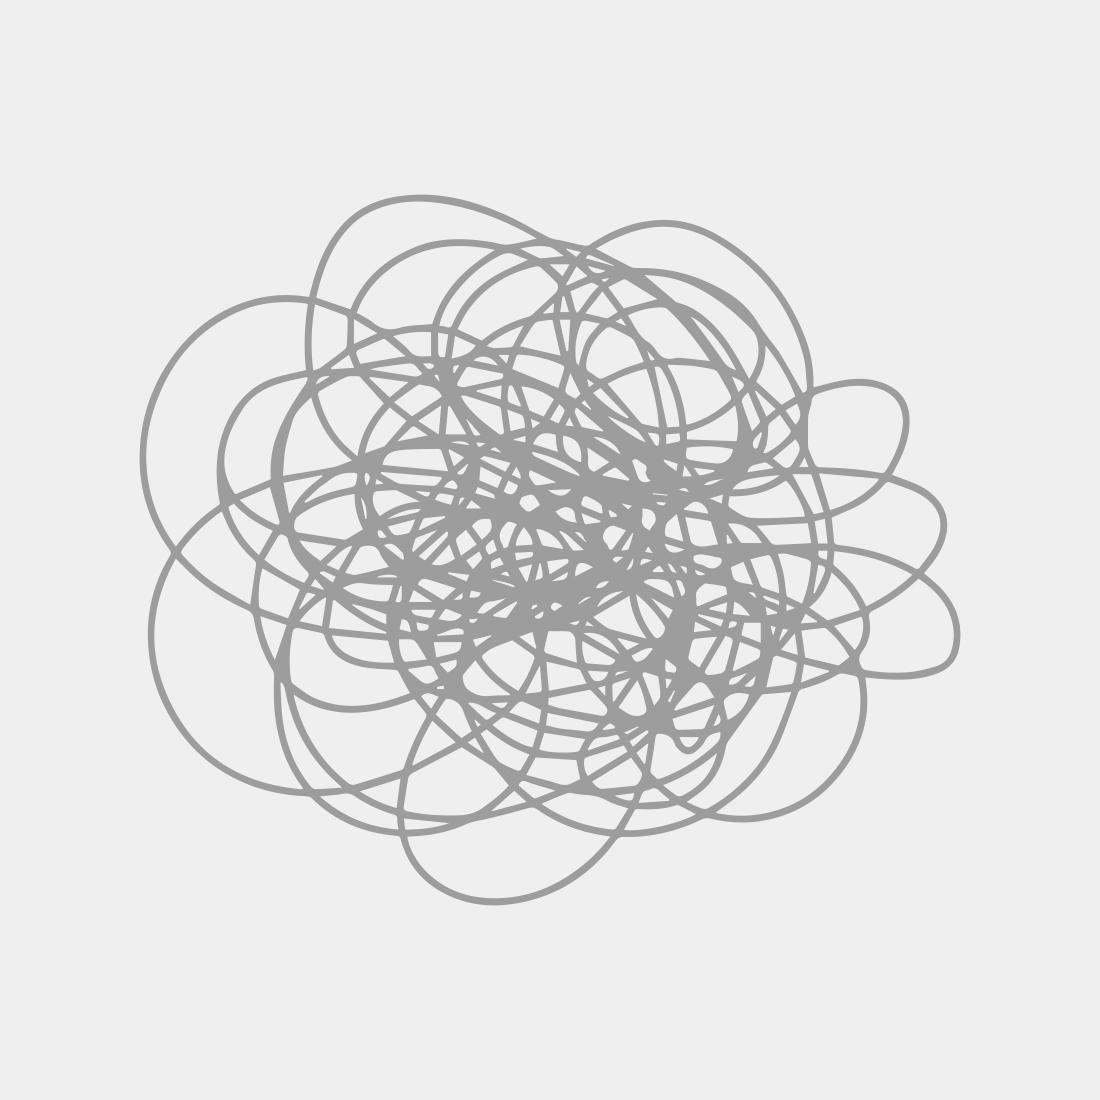 Angelica Kauffman catalogue